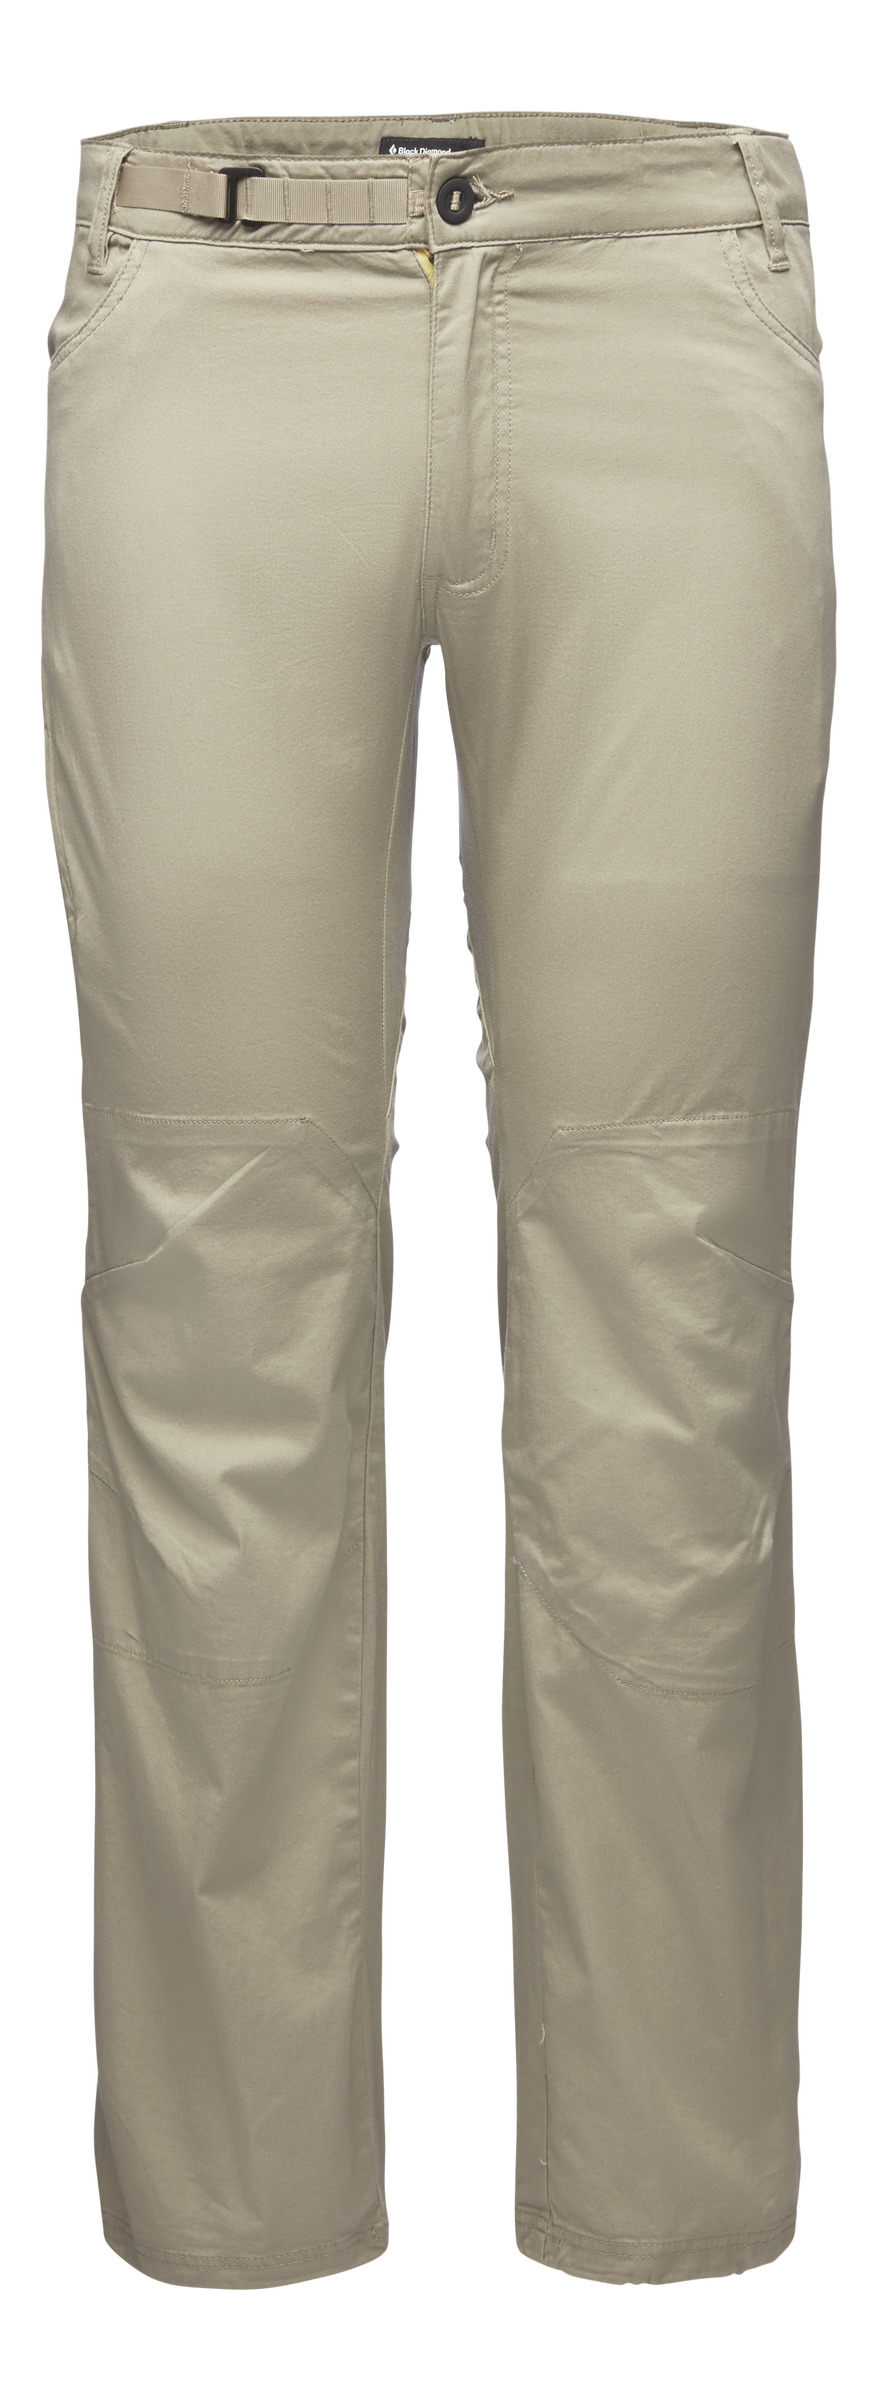 Black Diamond - Credo Pants - Climbing pants - Men's